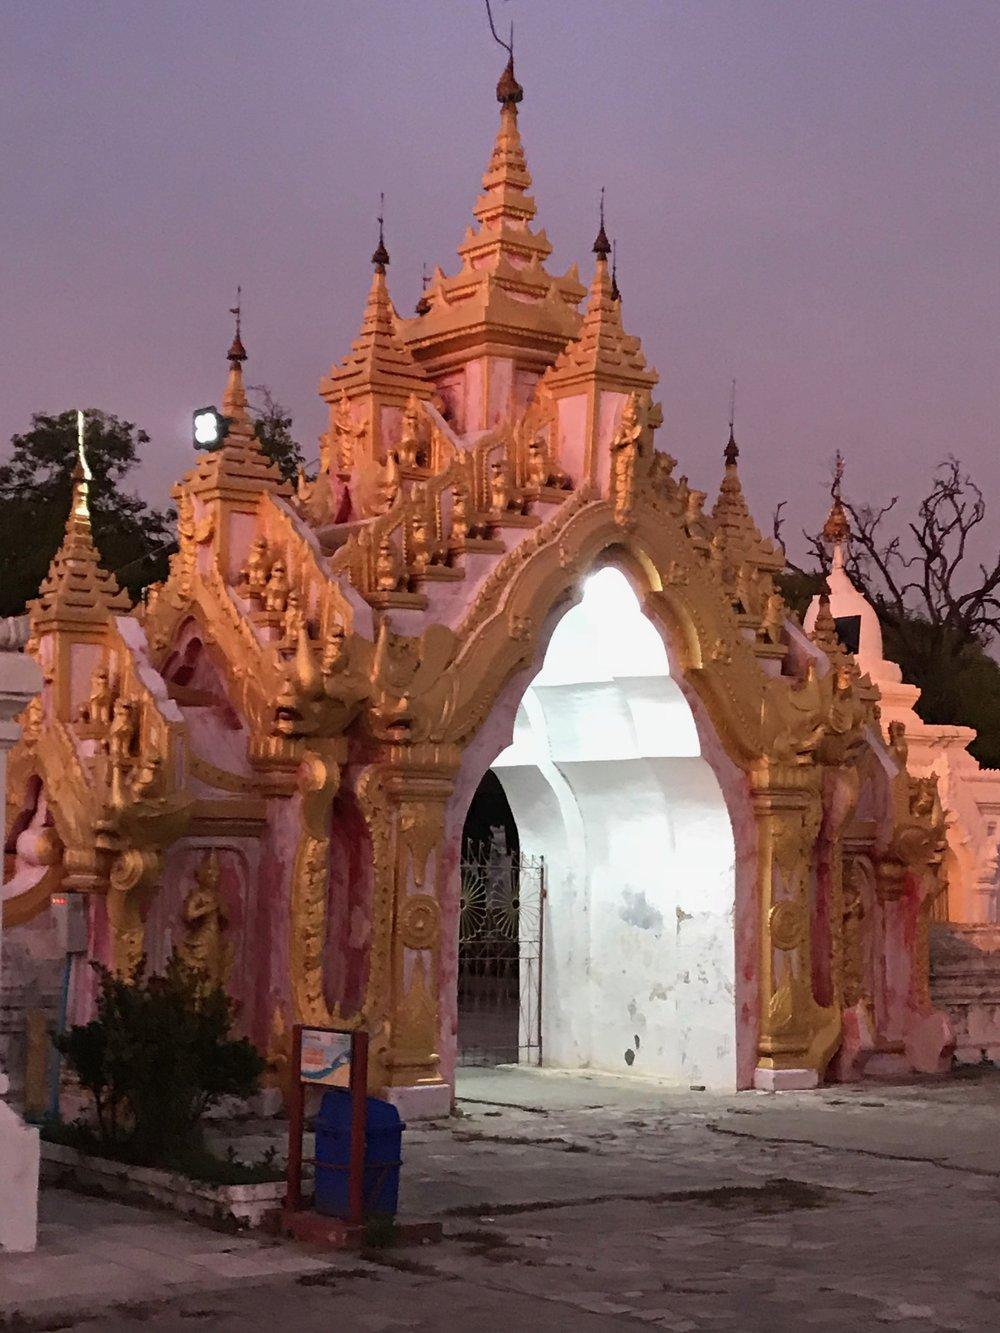 Orange Pagoda w Light contrast.jpg*.jpg